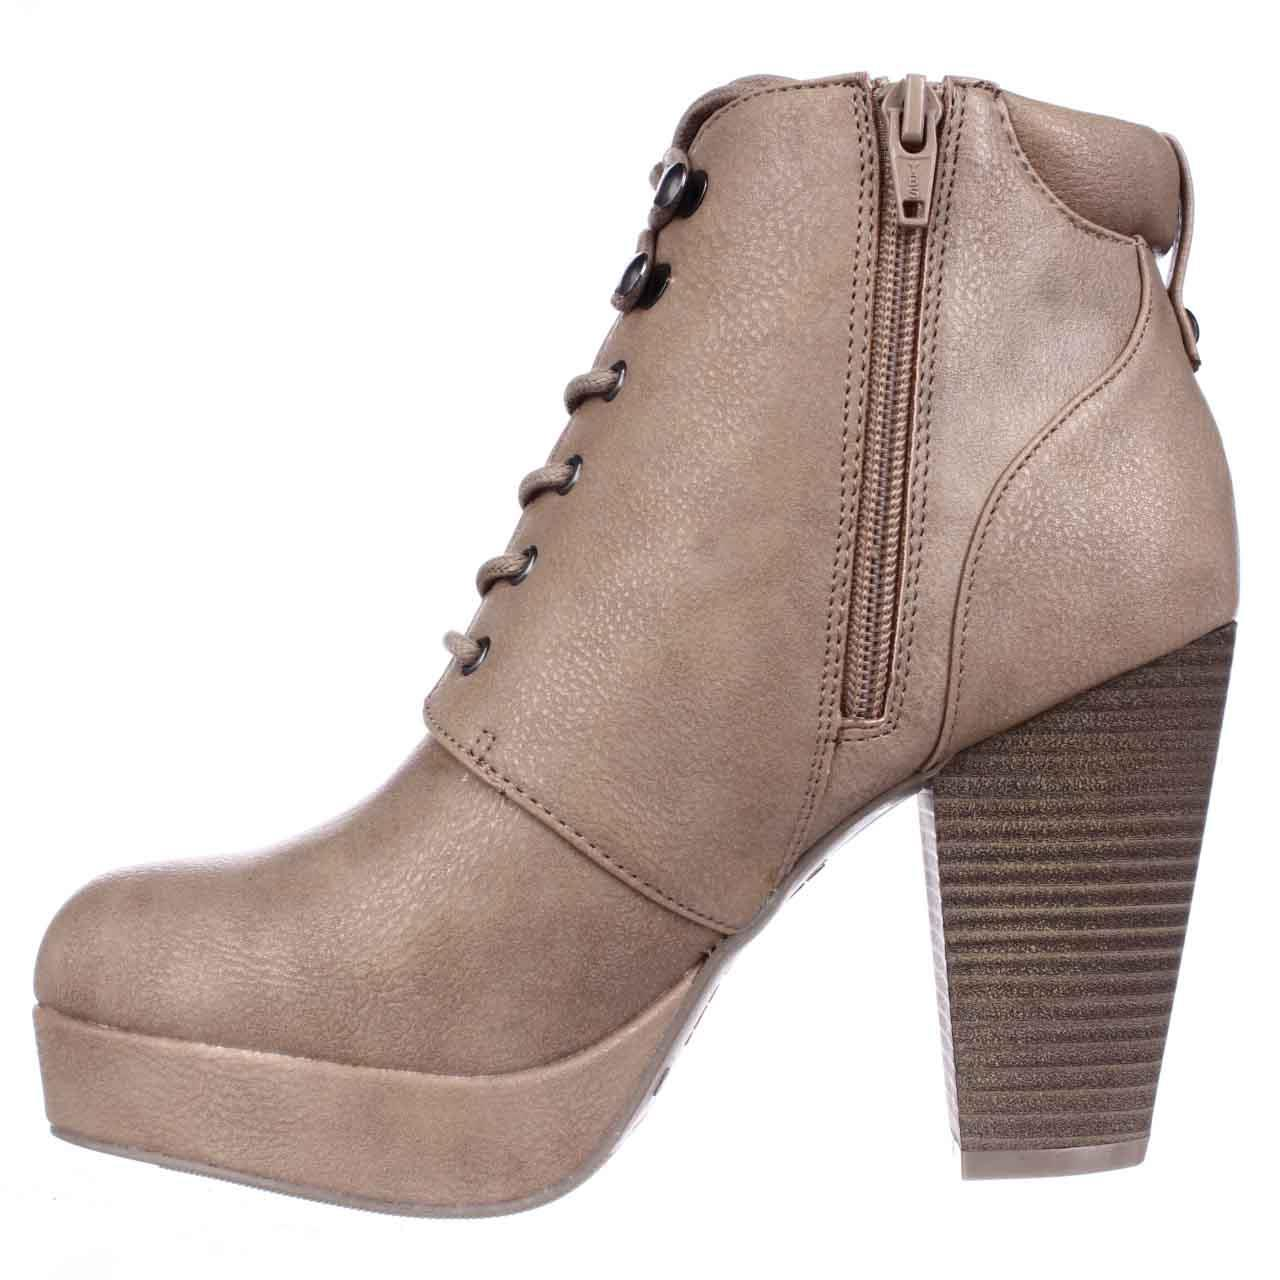 Womens MG35 Rheta Platform Ankle Boots - Tan